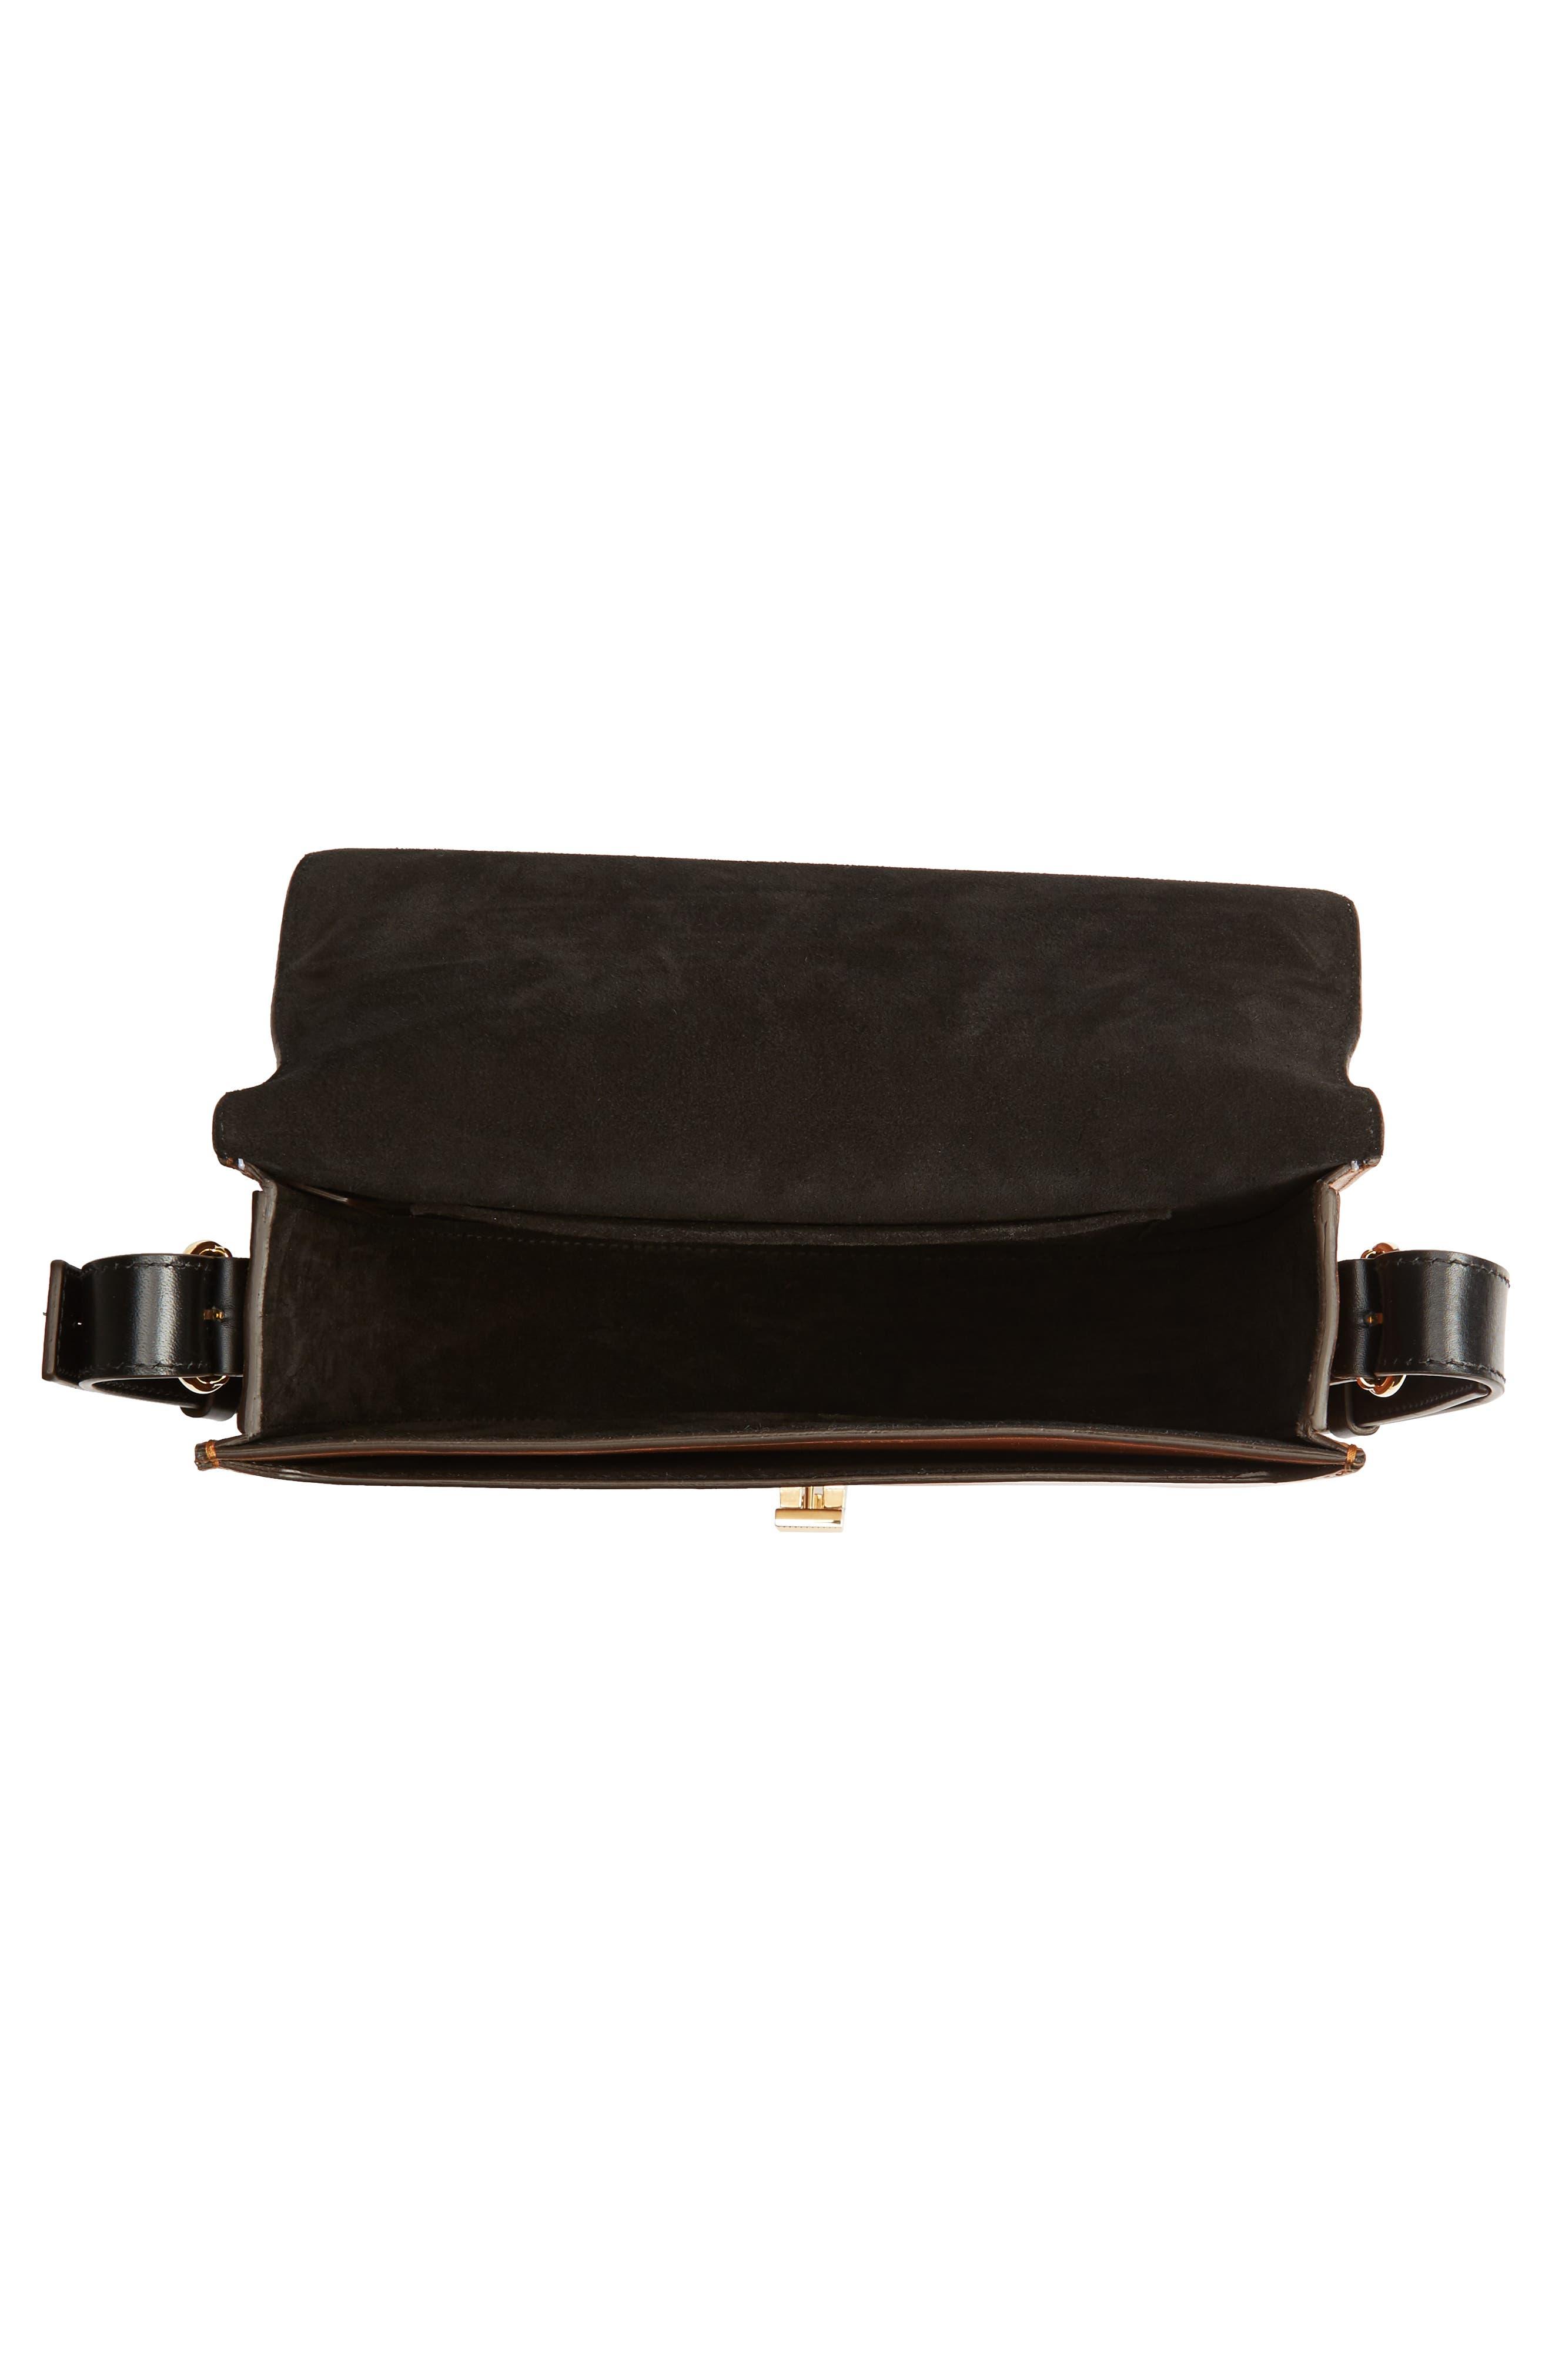 Half Moon Box Shoulder Bag,                             Alternate thumbnail 4, color,                             White/ Ambra/ Black